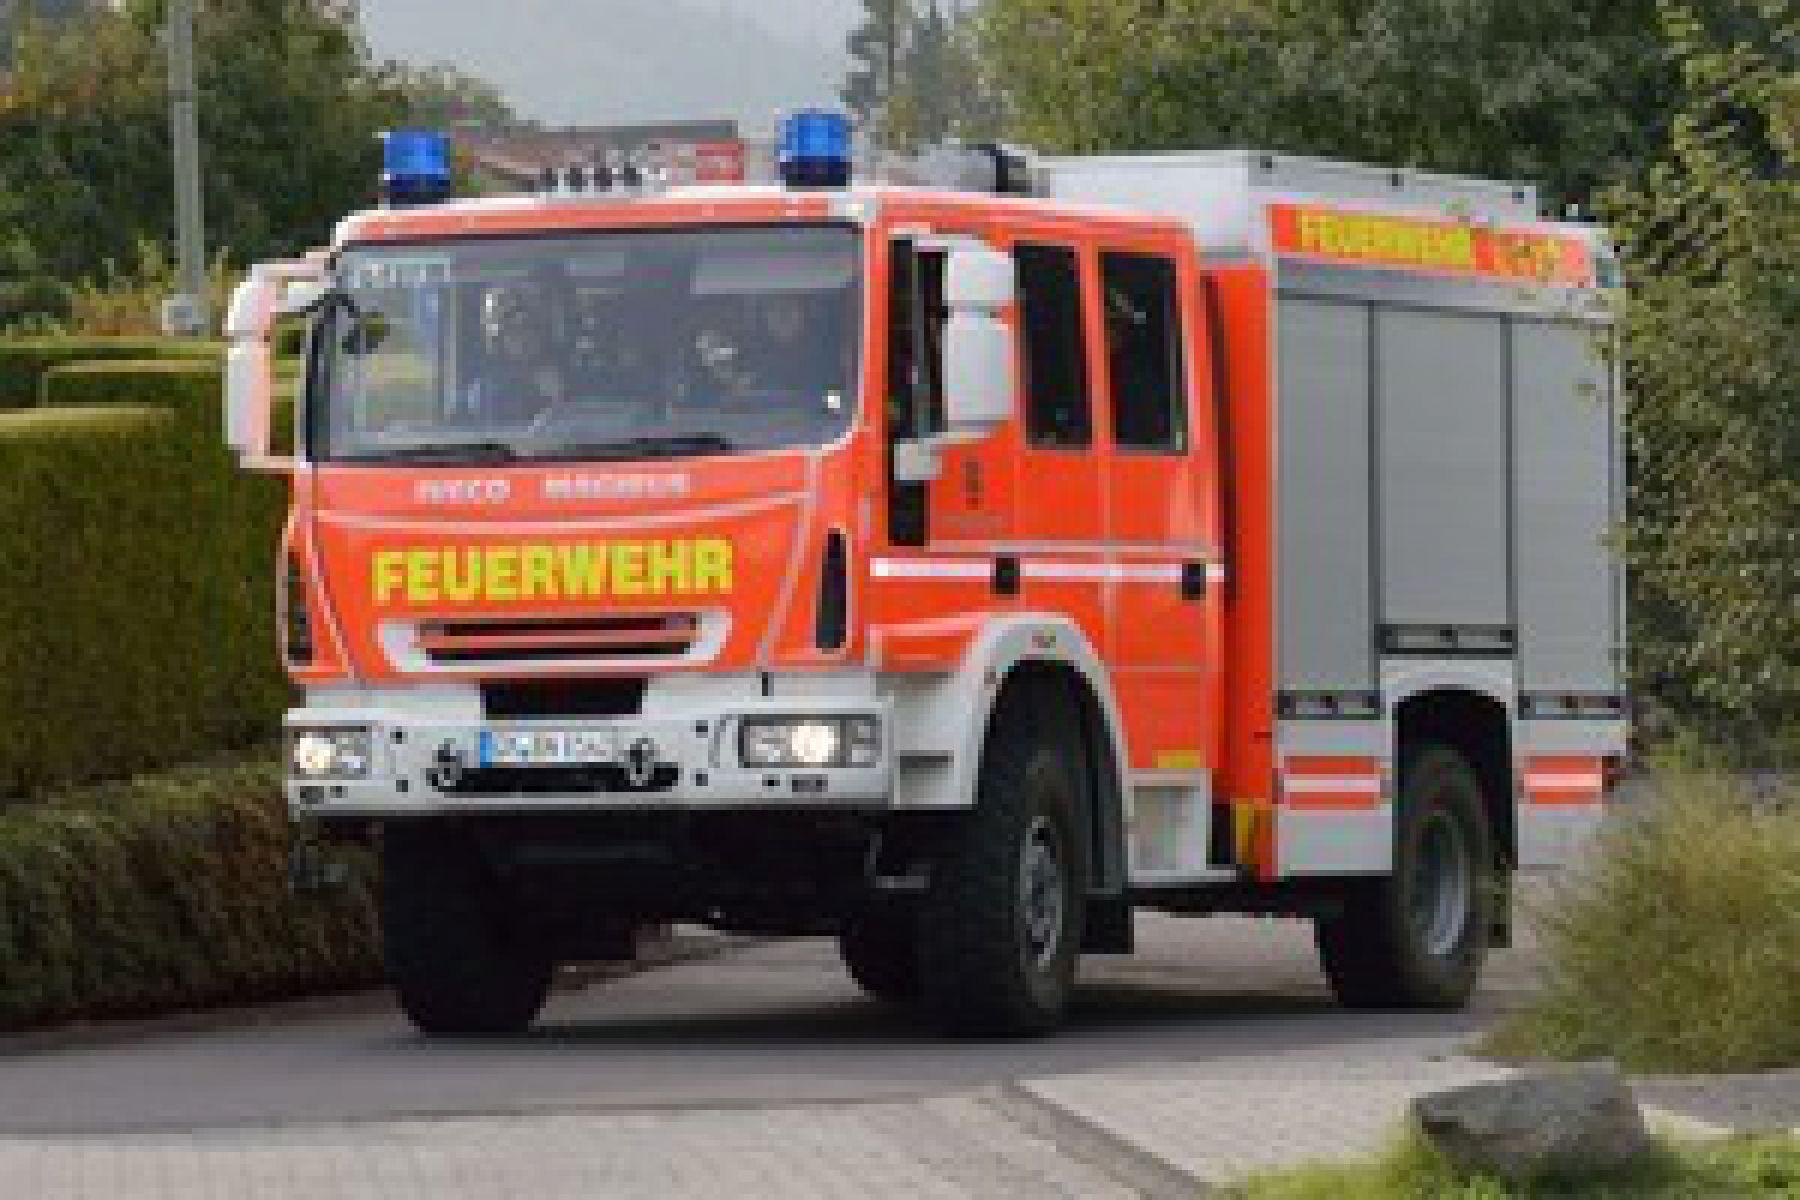 Loeschgruppenfahrzeug Lf 10 6